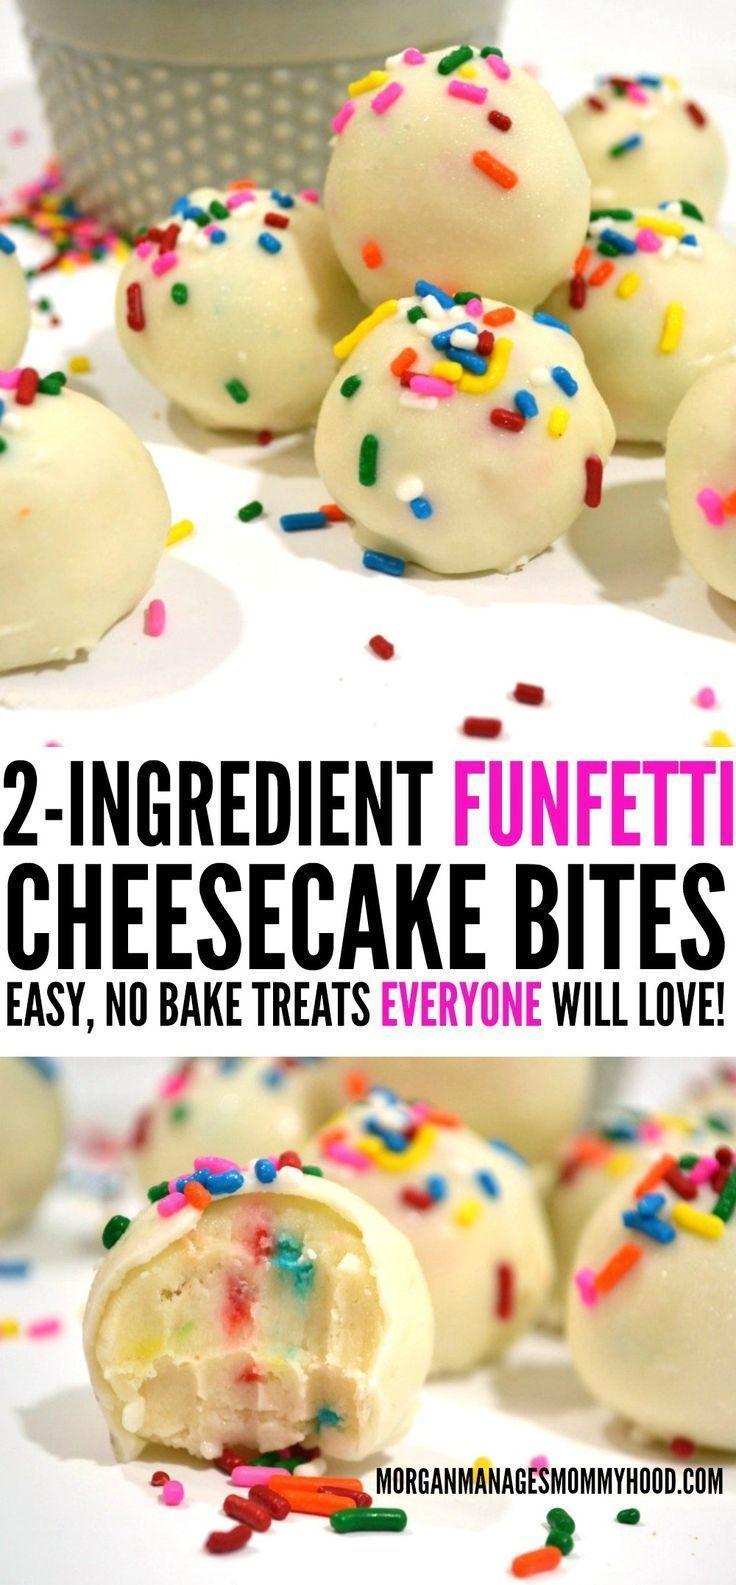 Kasekuchen Ingredient Ksekuchen Recipes Batter Bites Bake Cake Try No Tono Bake 2 I 2 Ingredient Cakes Easy No Bake Desserts Cheesecake Bites Recipe